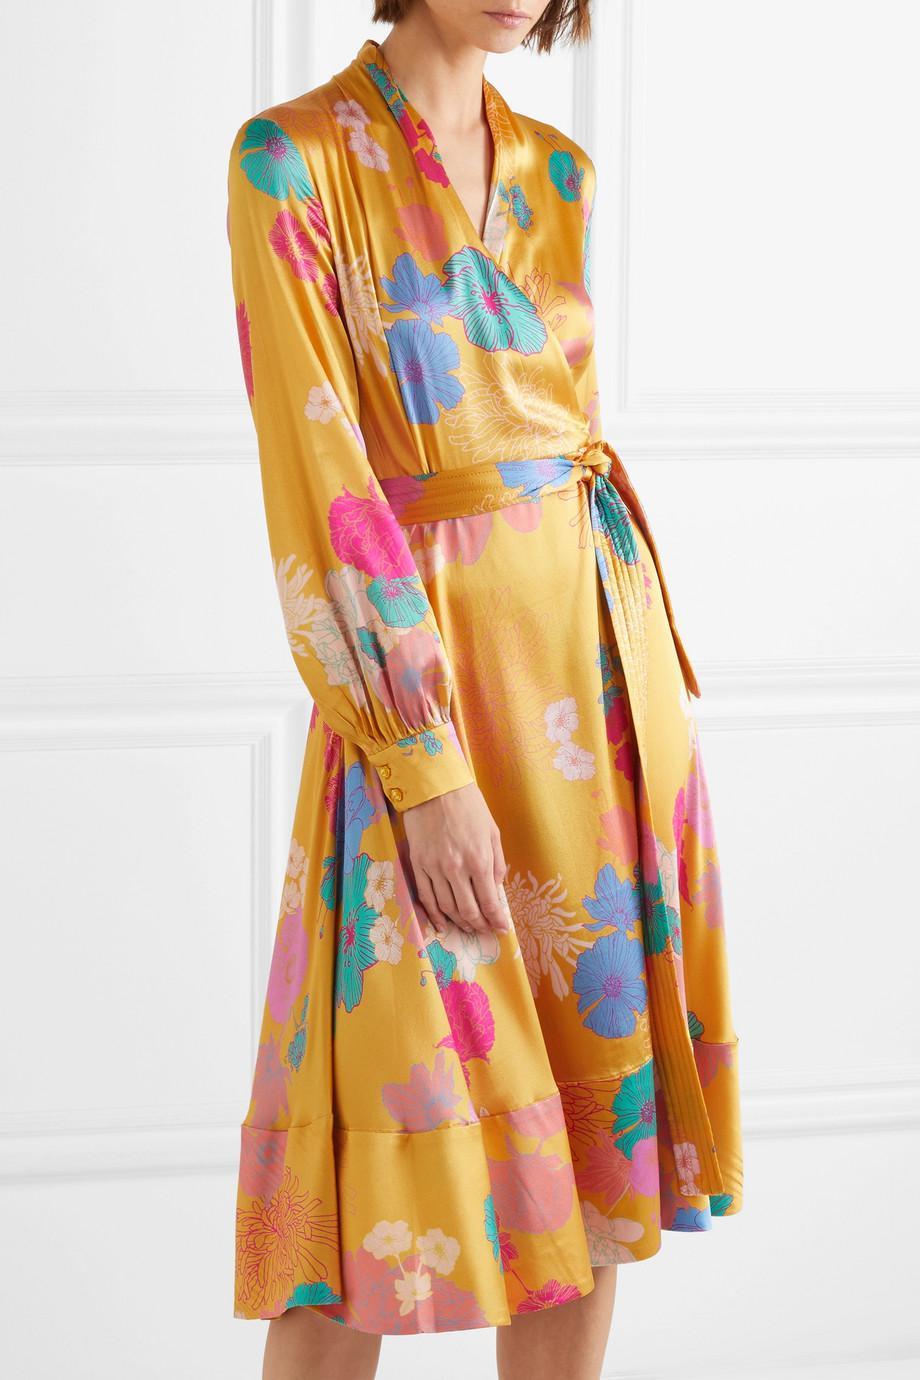 Reflection Floral-print Silk-blend Satin Wrap Dress - Marigold Stine Goya Order Cheap Online Free Shipping New Arrival Outlet Big Discount Ah98ihhnxD